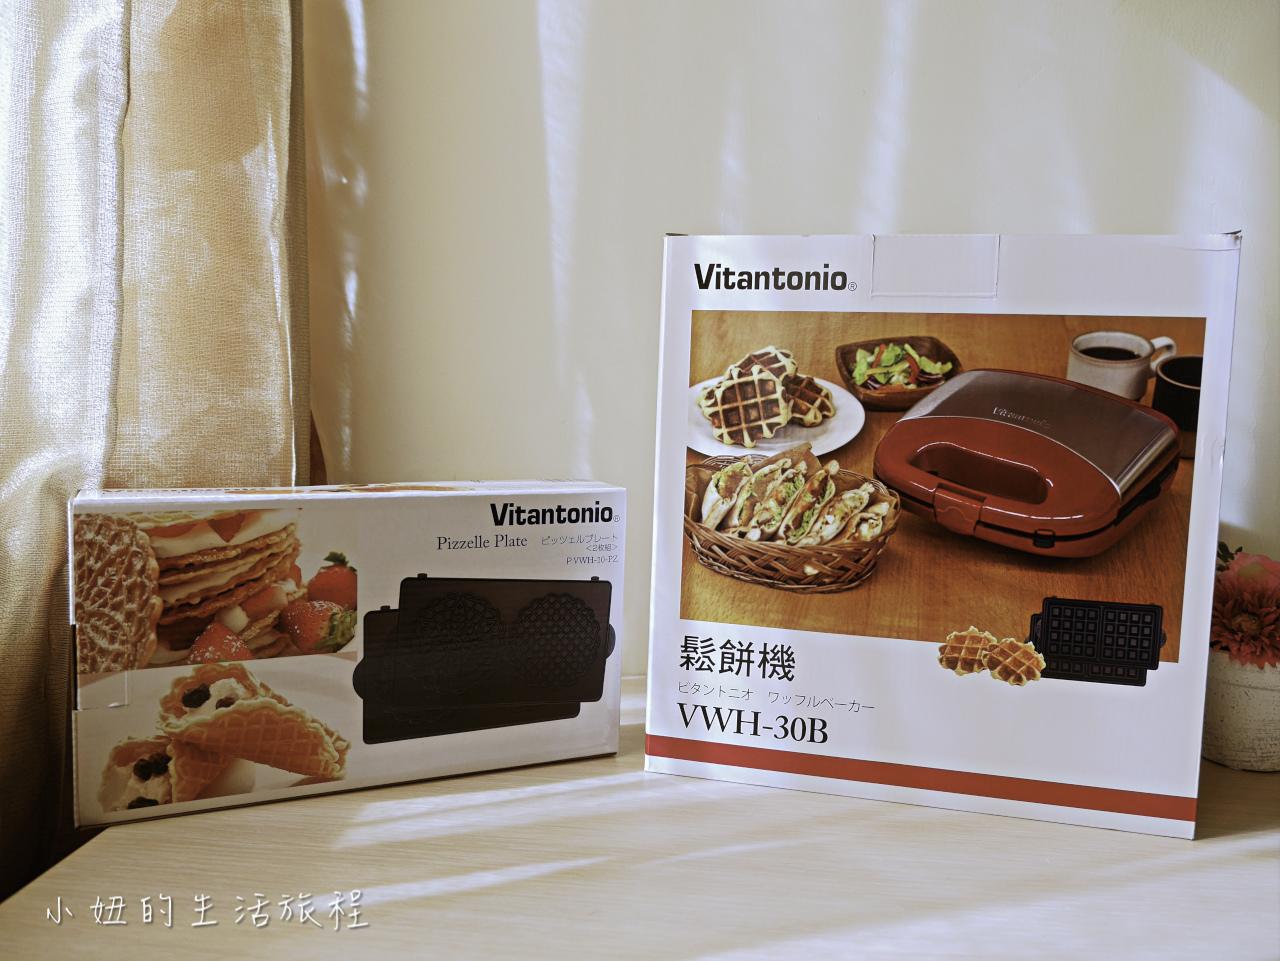 Vitantonio 鬆餅機VWH-30B ,蕾絲法式薄餅烤盤-1.jpg